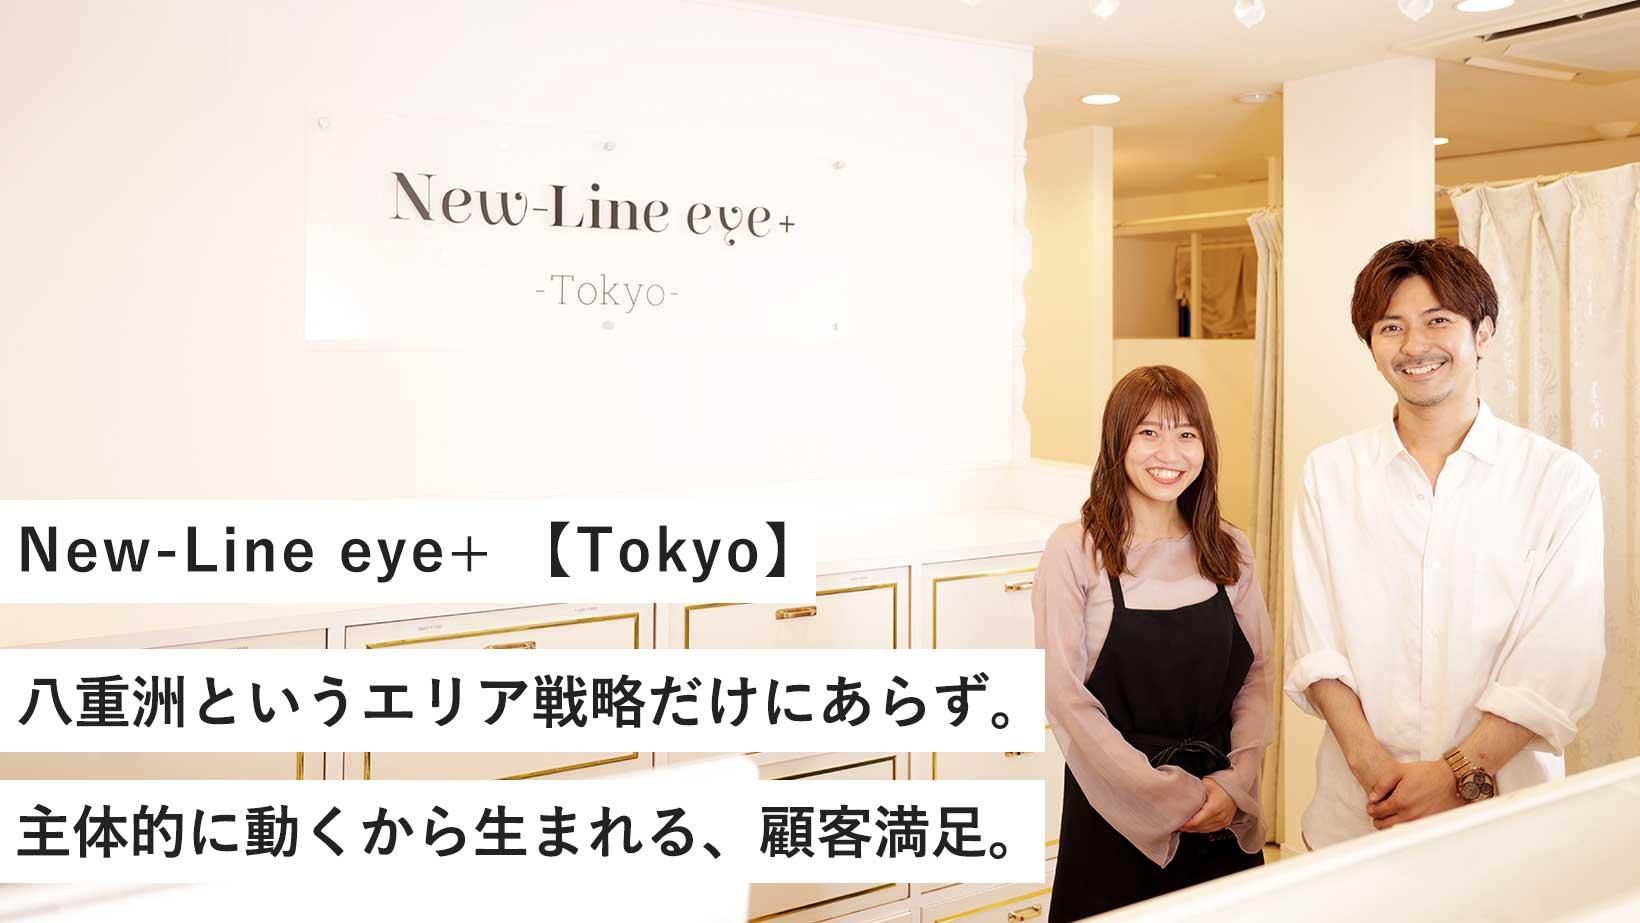 New-Line eye+ 【Tokyo】/主体的に動くから生まれる、顧客満足。